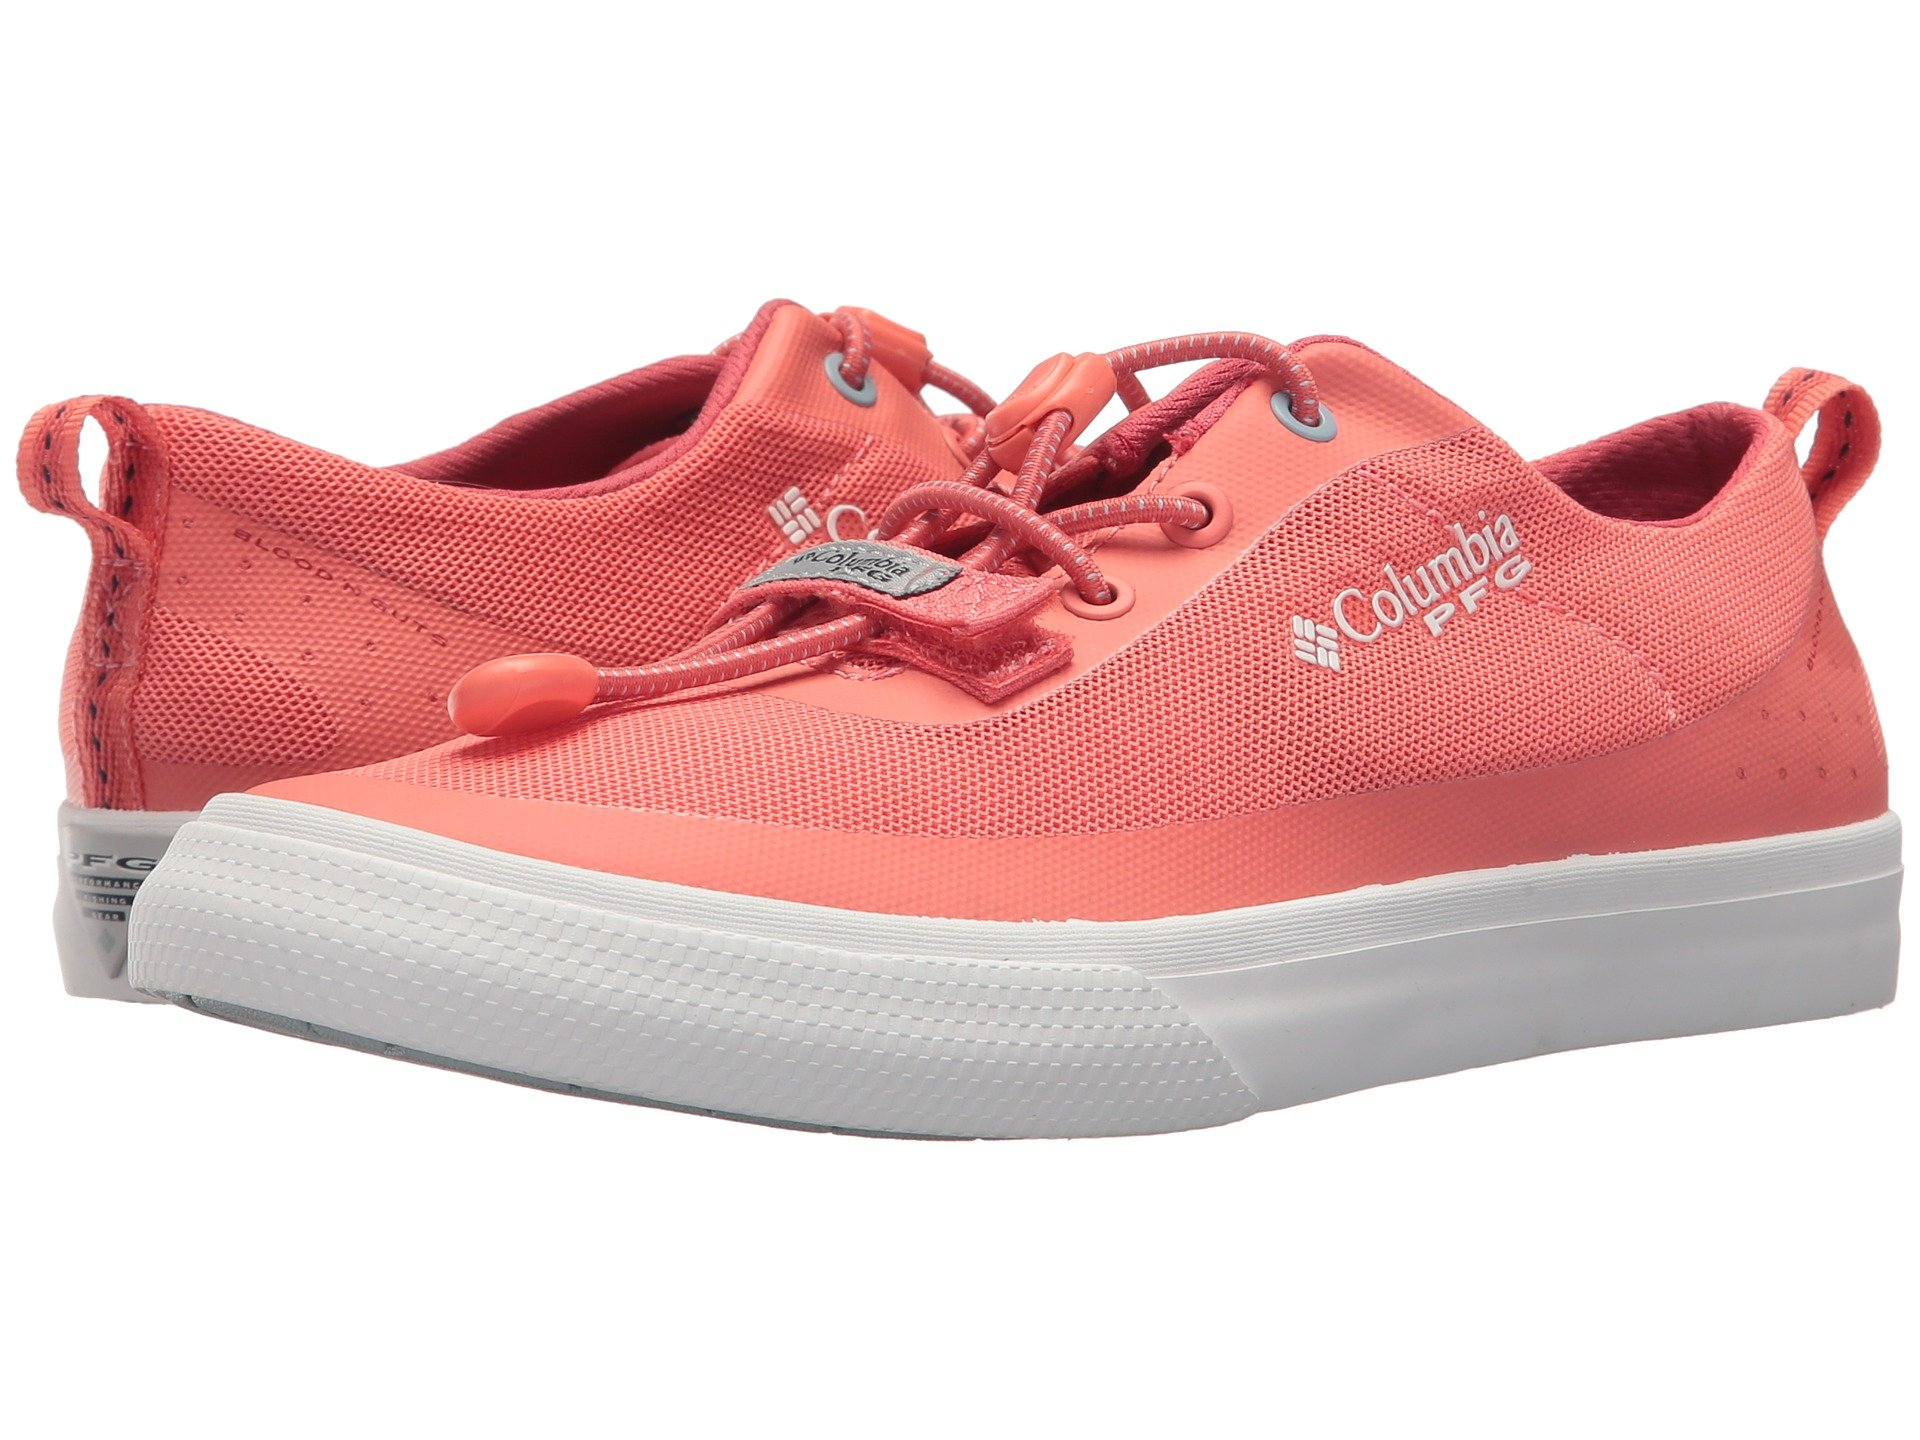 Boat Shoes para Mujer Columbia Dorado Cvo PFG  + Columbia en VeoyCompro.net